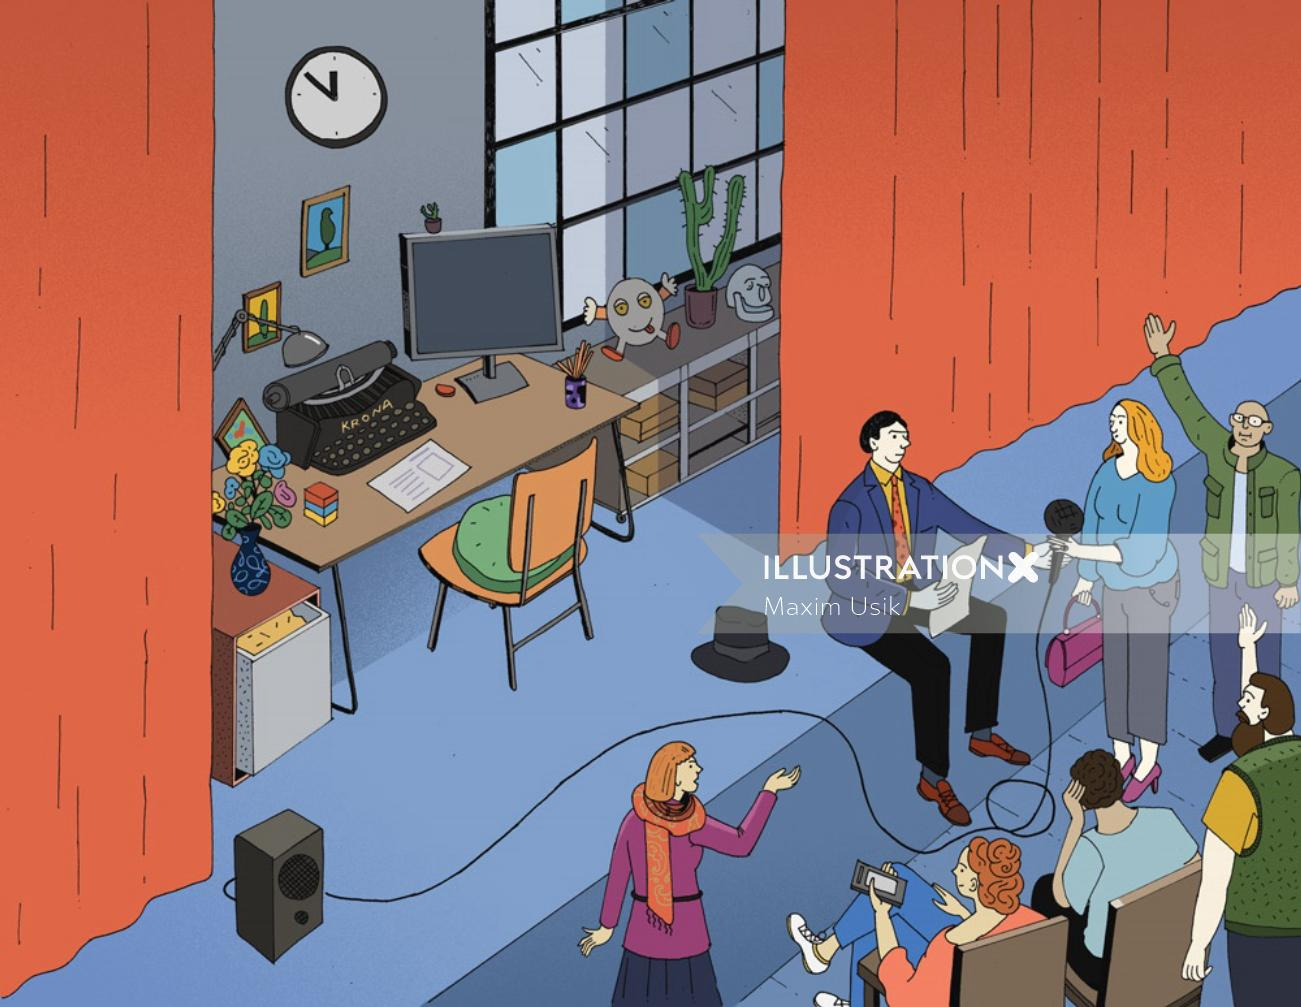 Editorial illustration for Journalist magazine by Maxim Usik